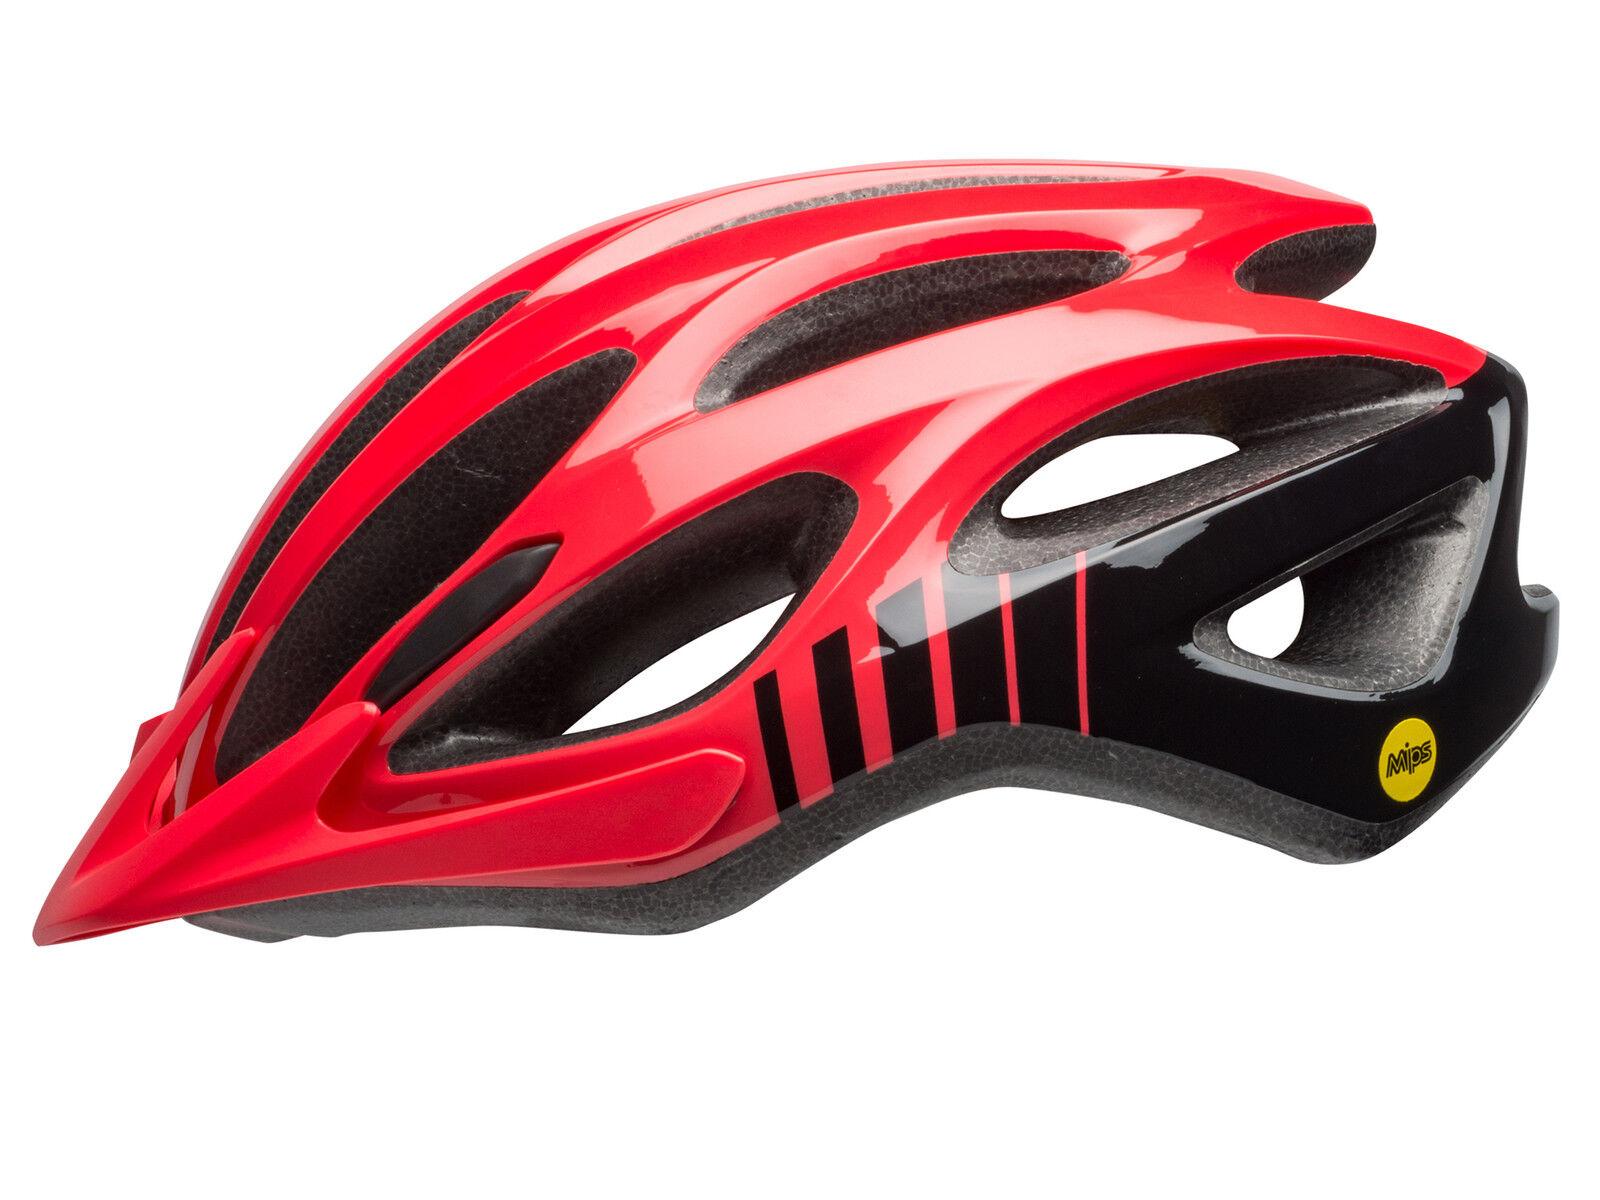 Bell Traverse MIPS Fahrrad Helm Gr. Gr. Gr. 54-61cm rot schwarz 2018 f241e6